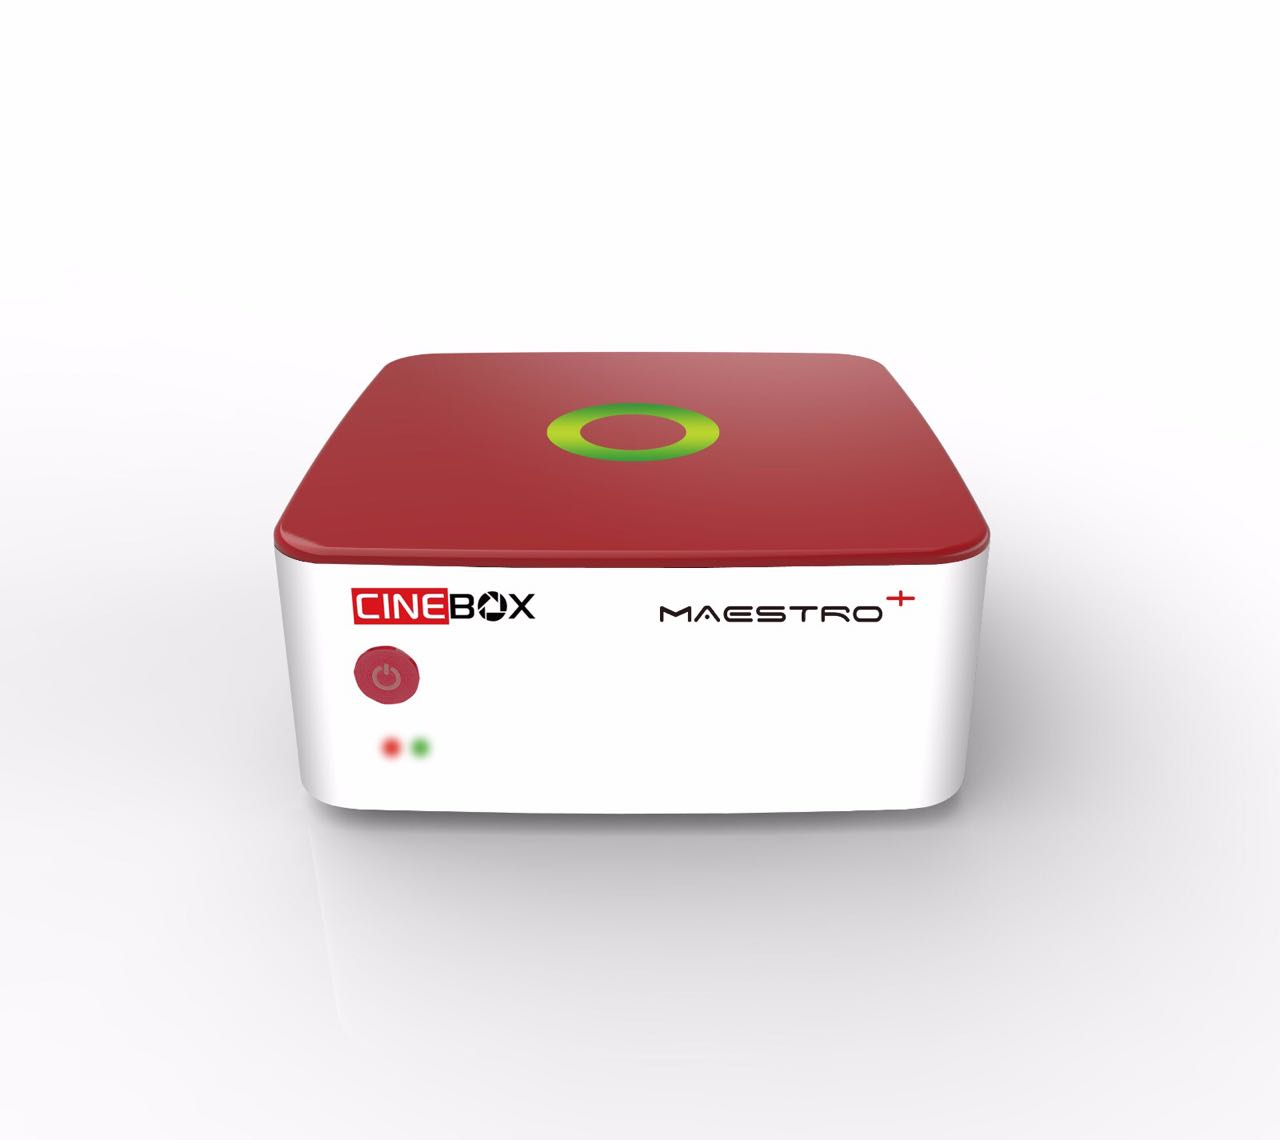 novo receptor CINEBOX MAESTRO +